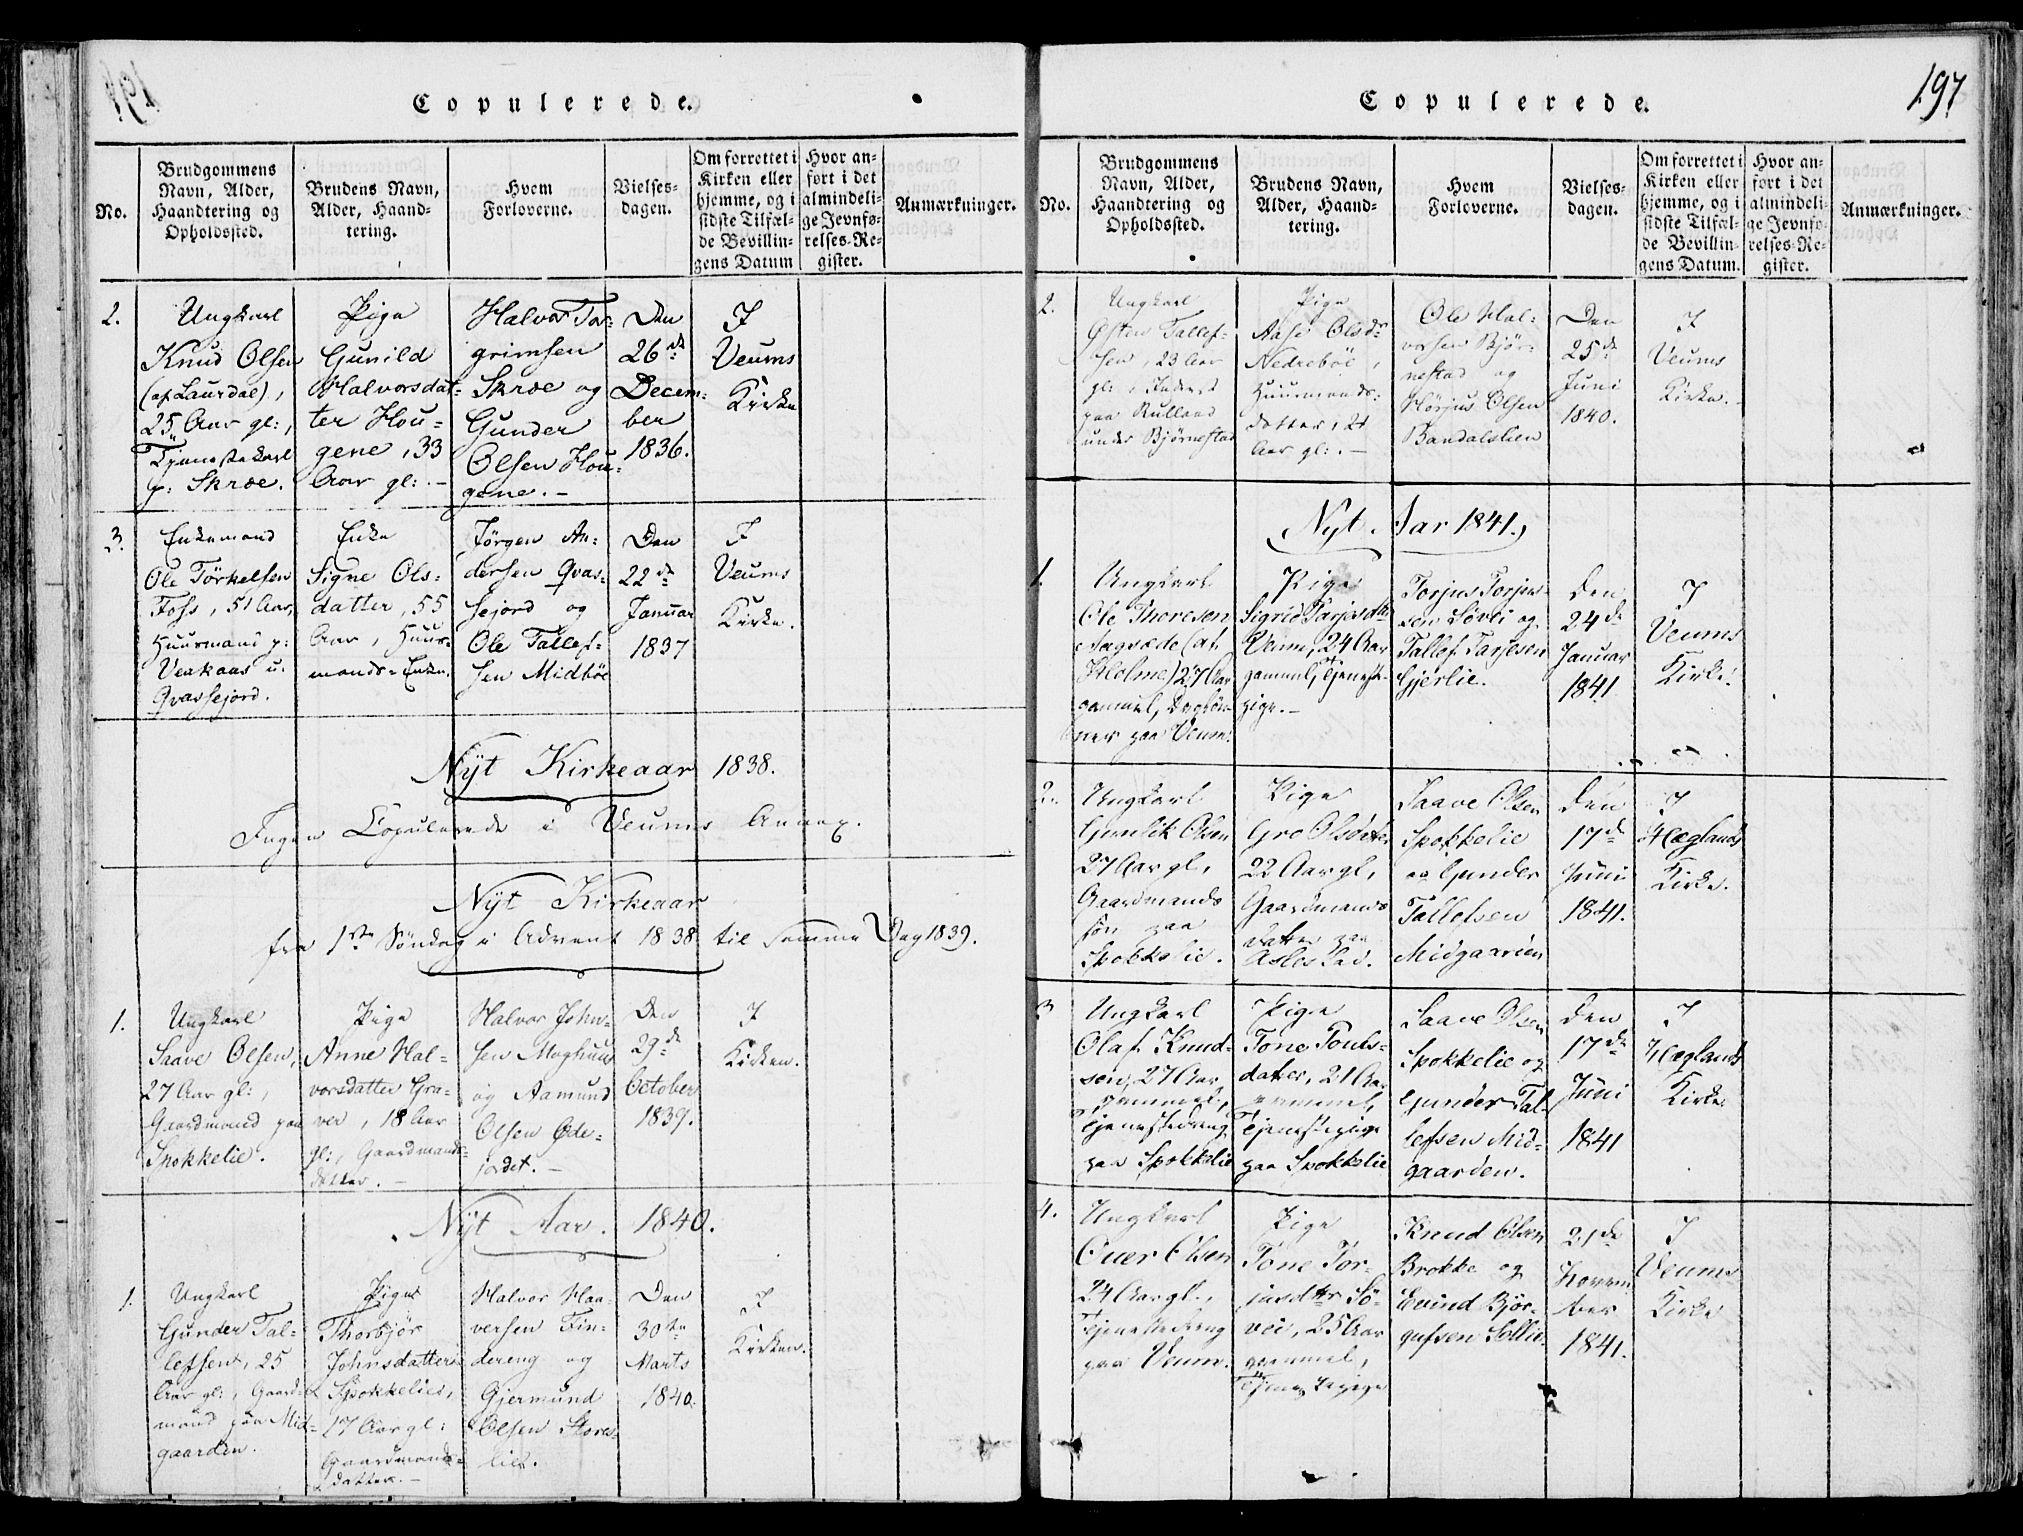 SAKO, Fyresdal kirkebøker, F/Fb/L0001: Ministerialbok nr. II 1, 1815-1854, s. 197